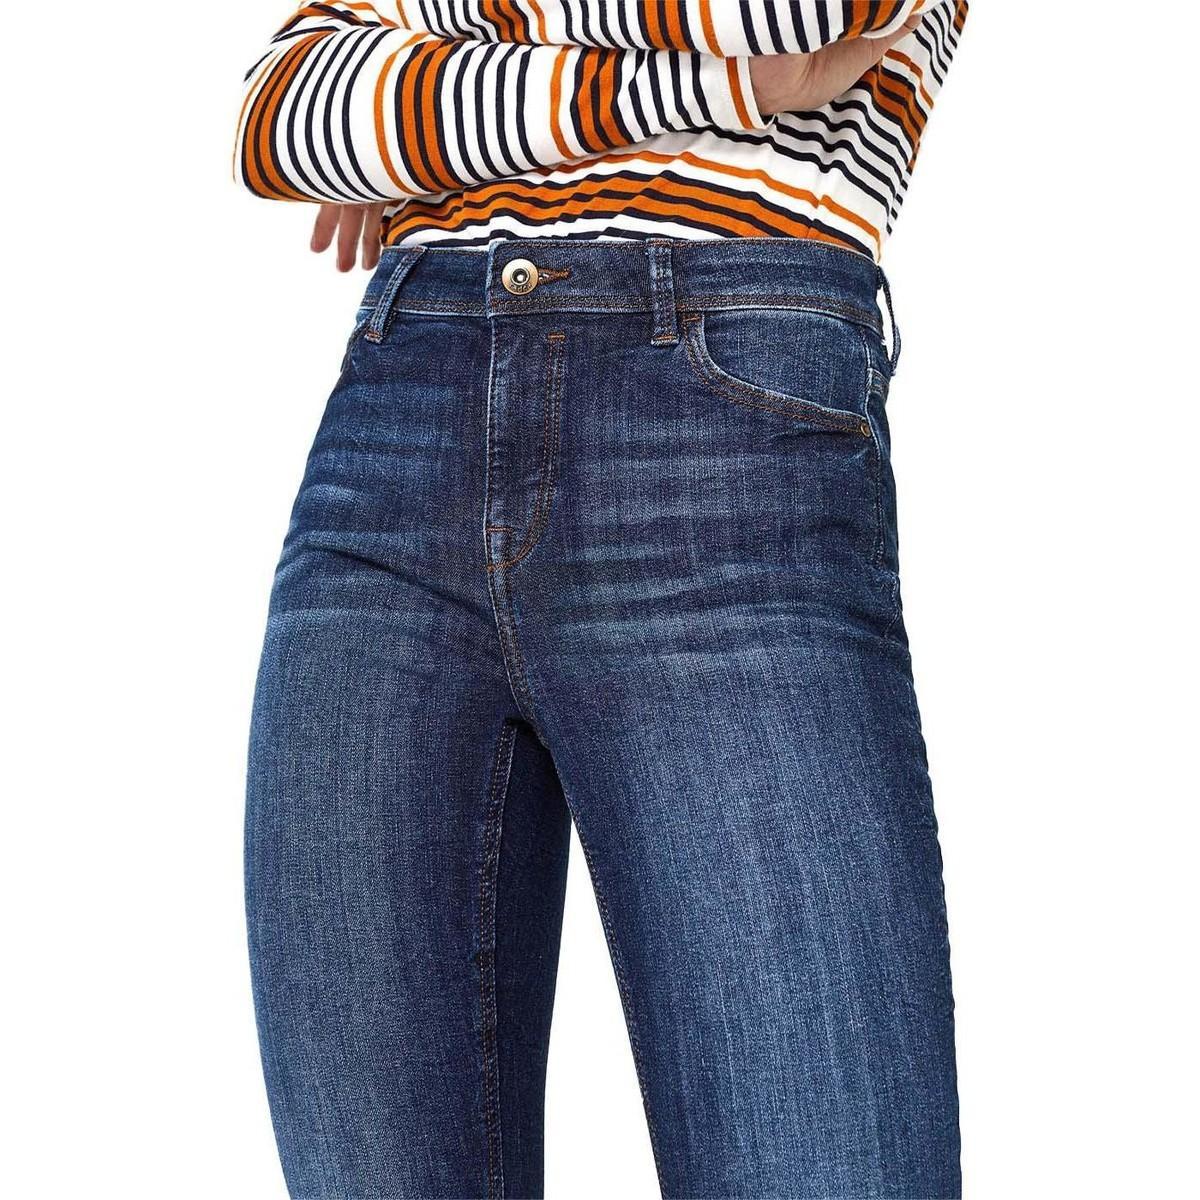 109CC1B018 Jeans Jean Esprit en coloris Bleu